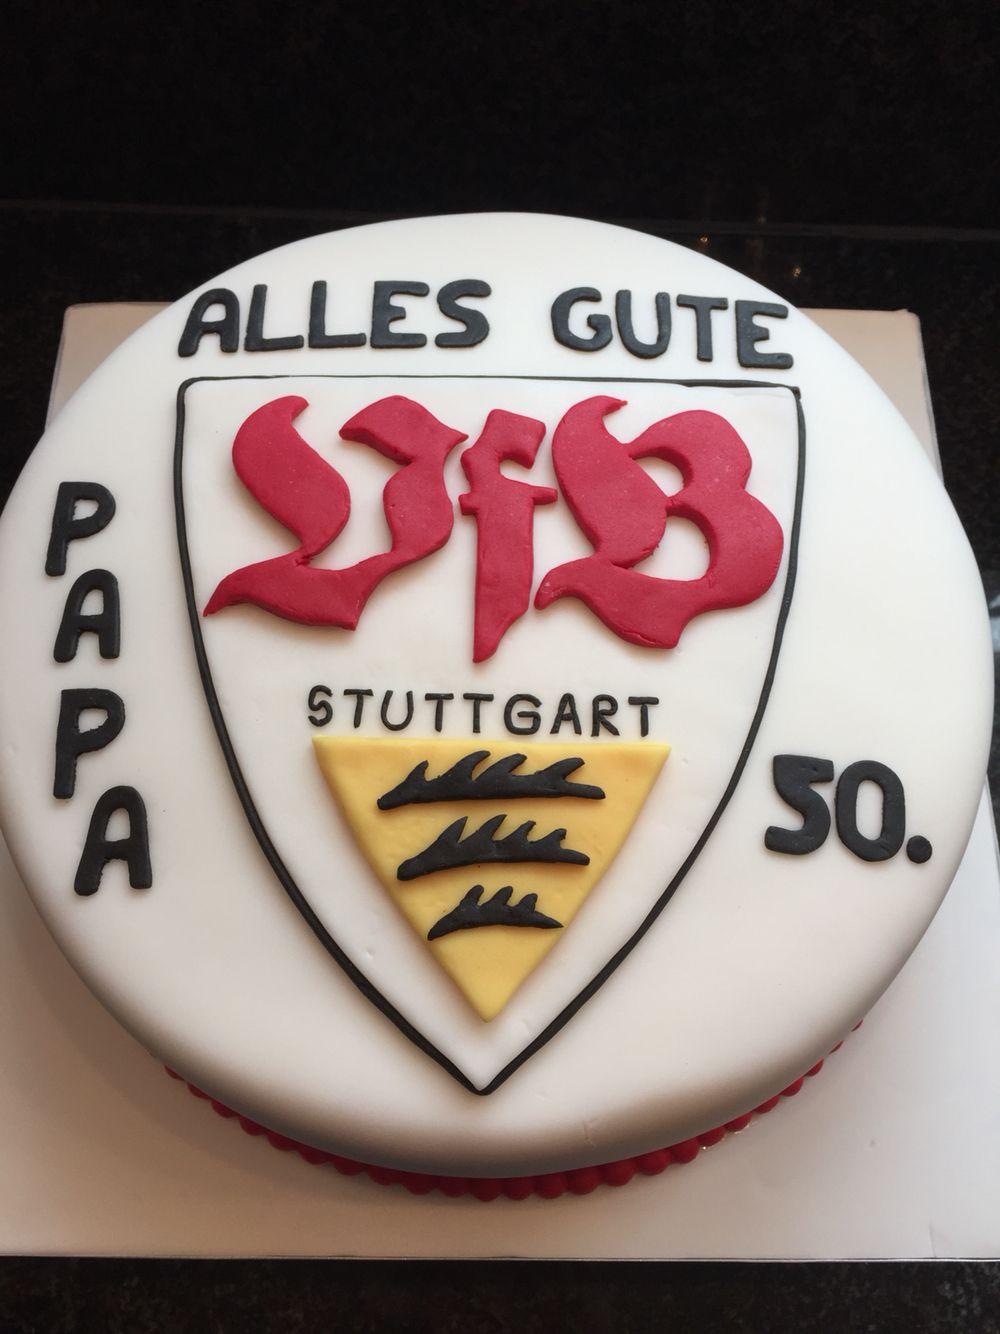 Vfb Stuttgart Birthday Cake Geburtstagstorte Bayern Torte Fondant Torte Geburtstag